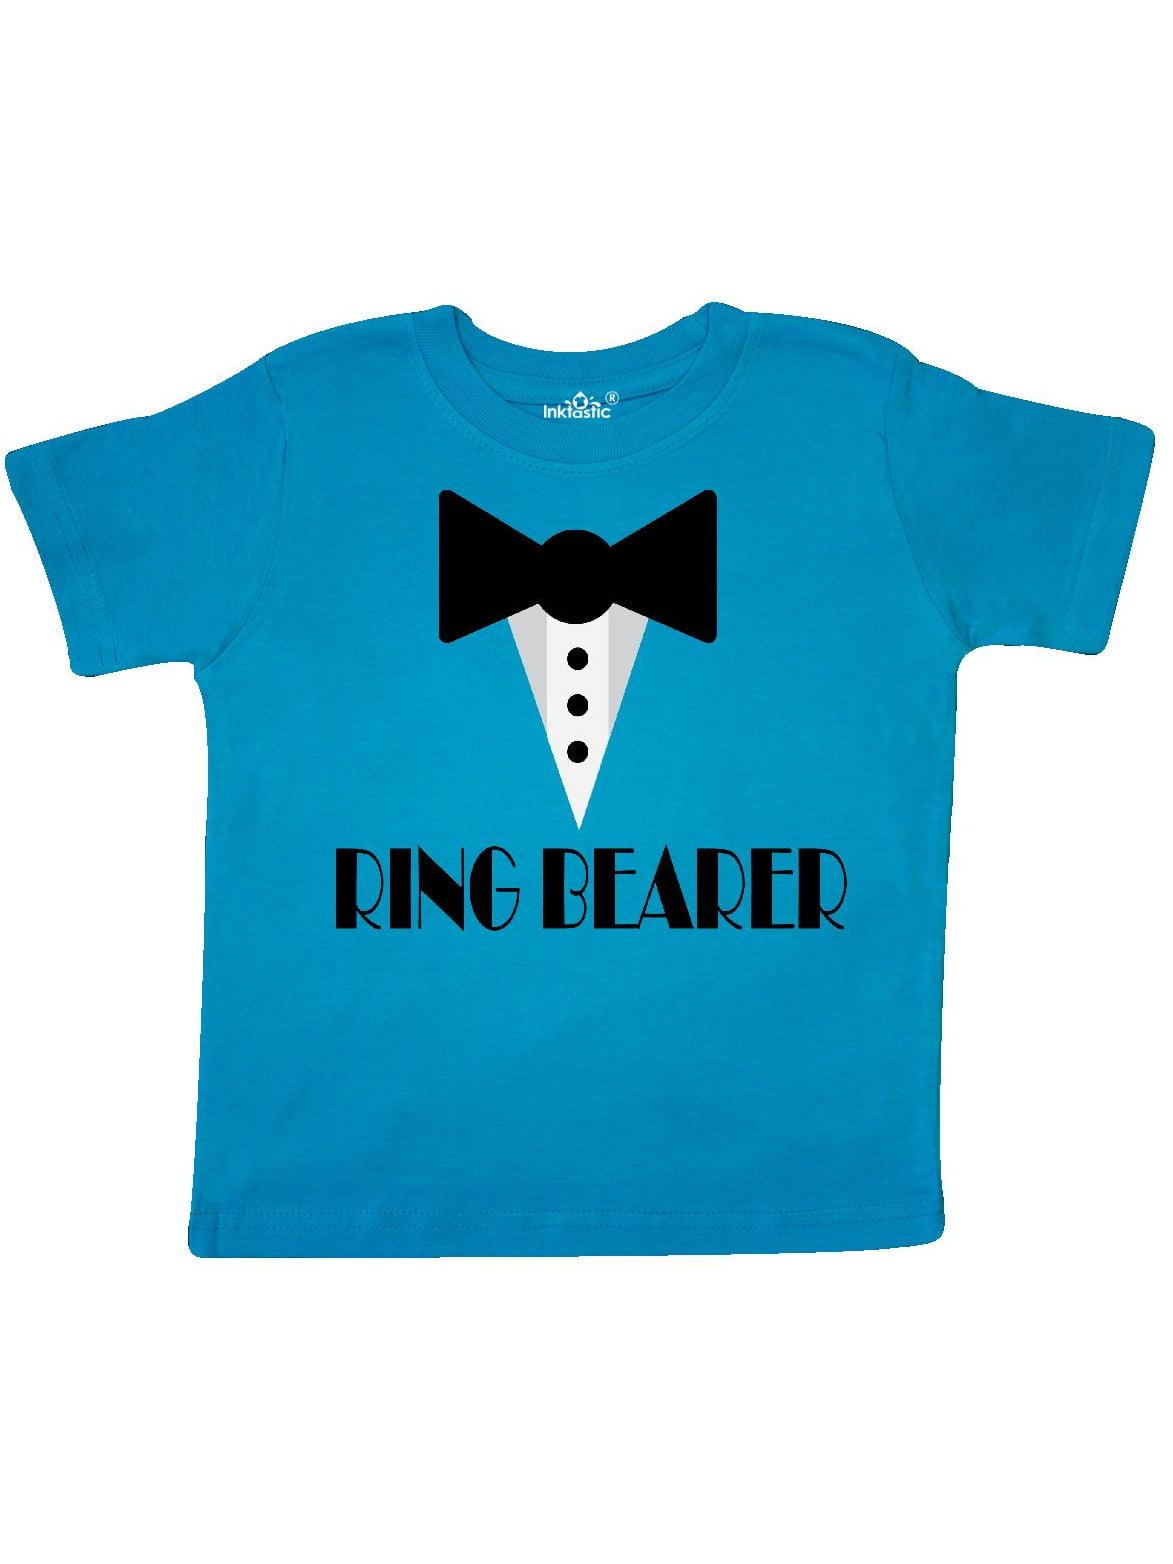 Ringbearer Mock Tux Wedding Tuxedo Toddler T-Shirt - Walmart.com